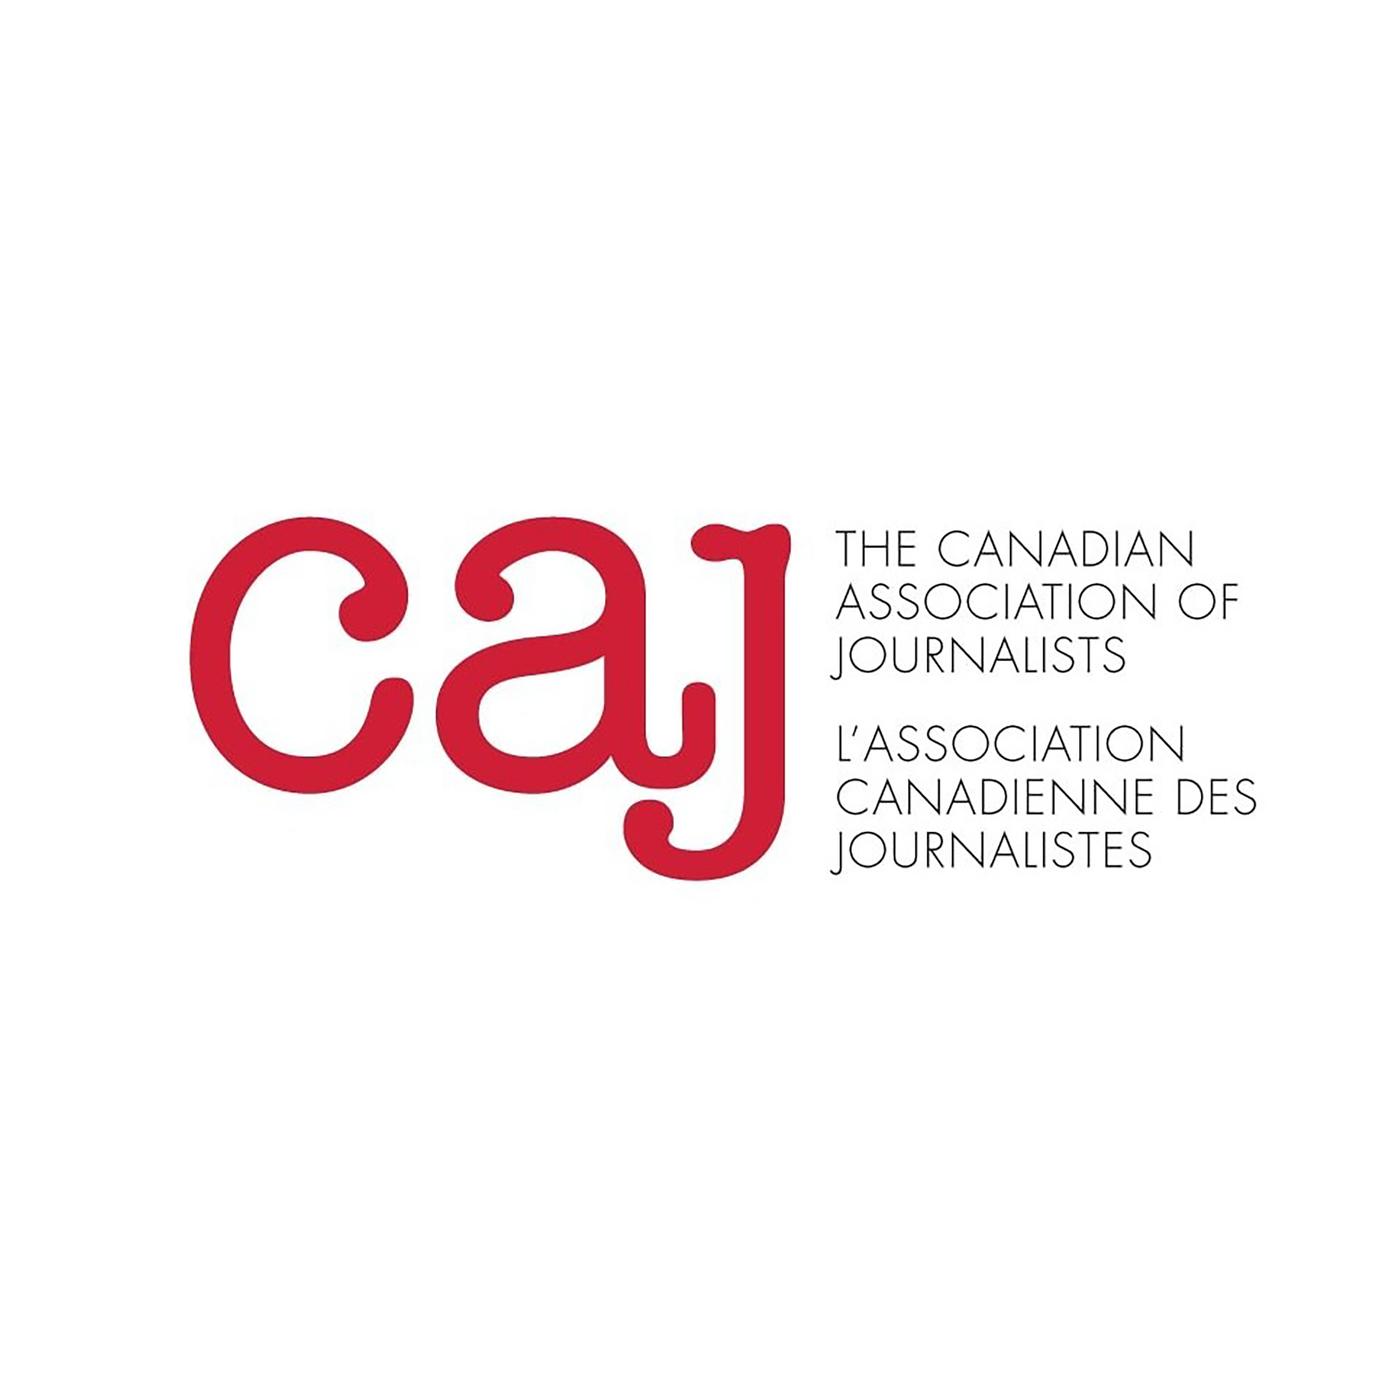 Canadian Association of Journalists (CAJ) President Brent Jolly